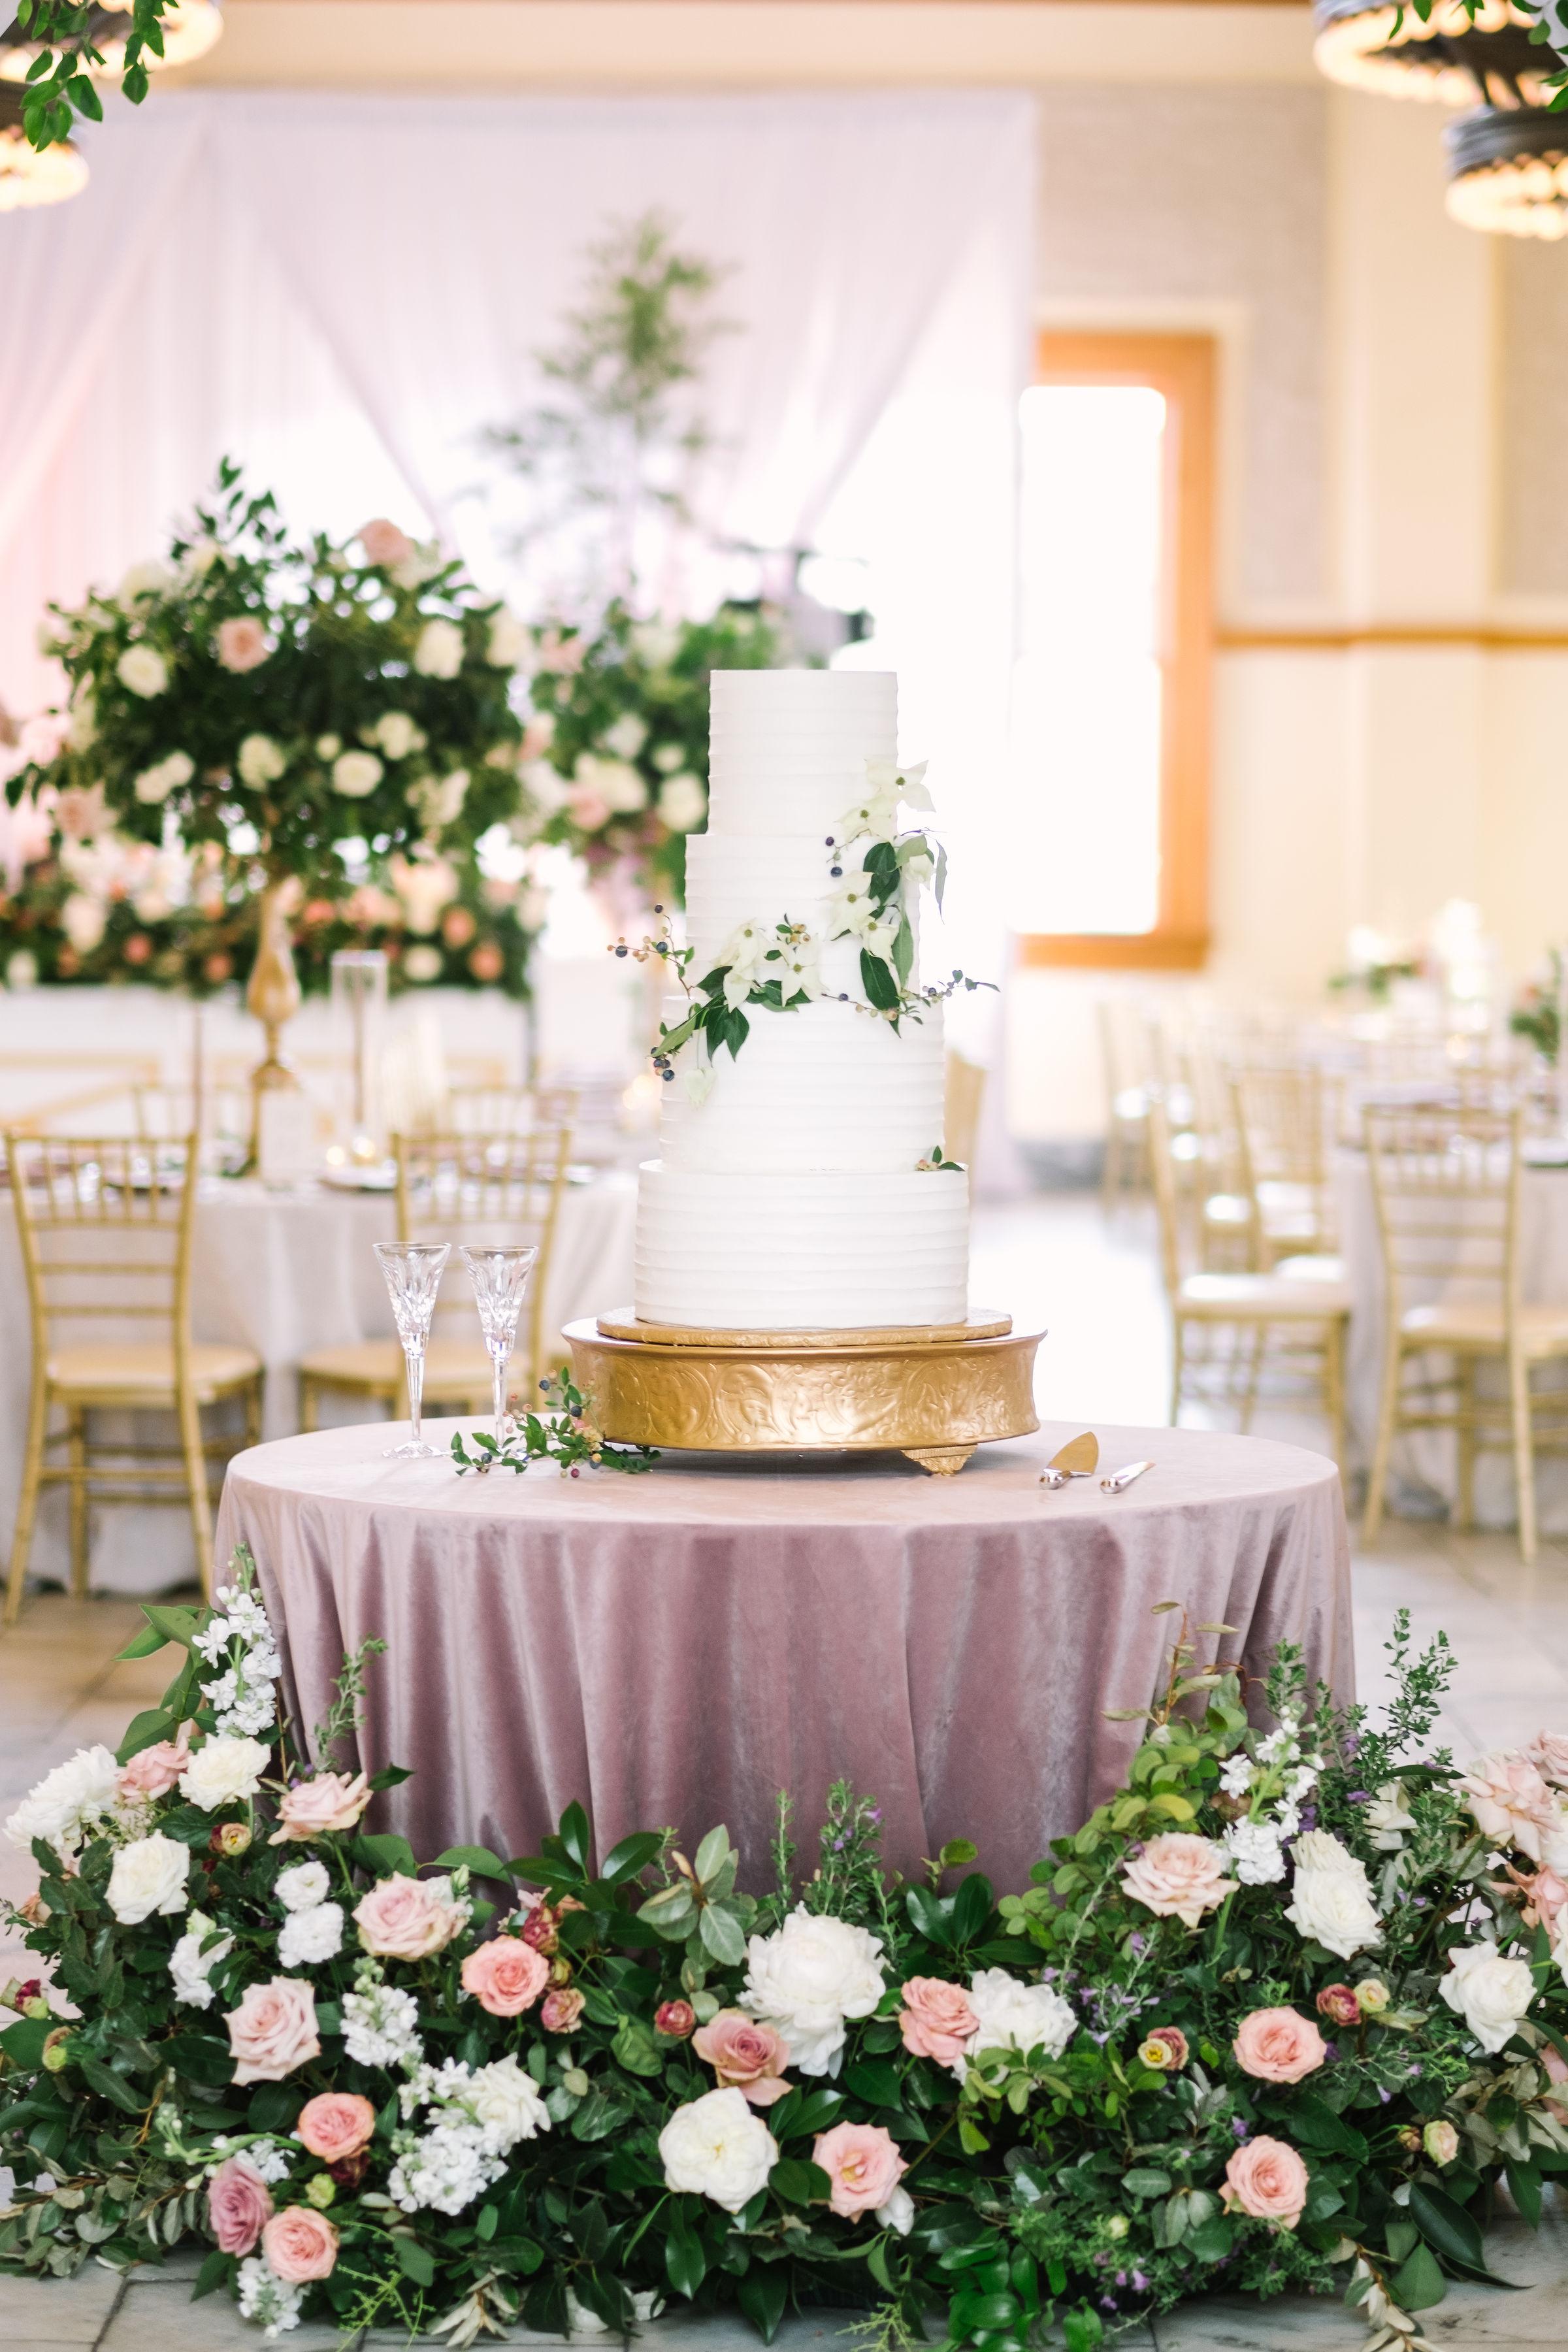 Ellen-Ashton-Photography-Girt-and-gold-events-weddings-Ashton-Depot-Weddings668.jpg